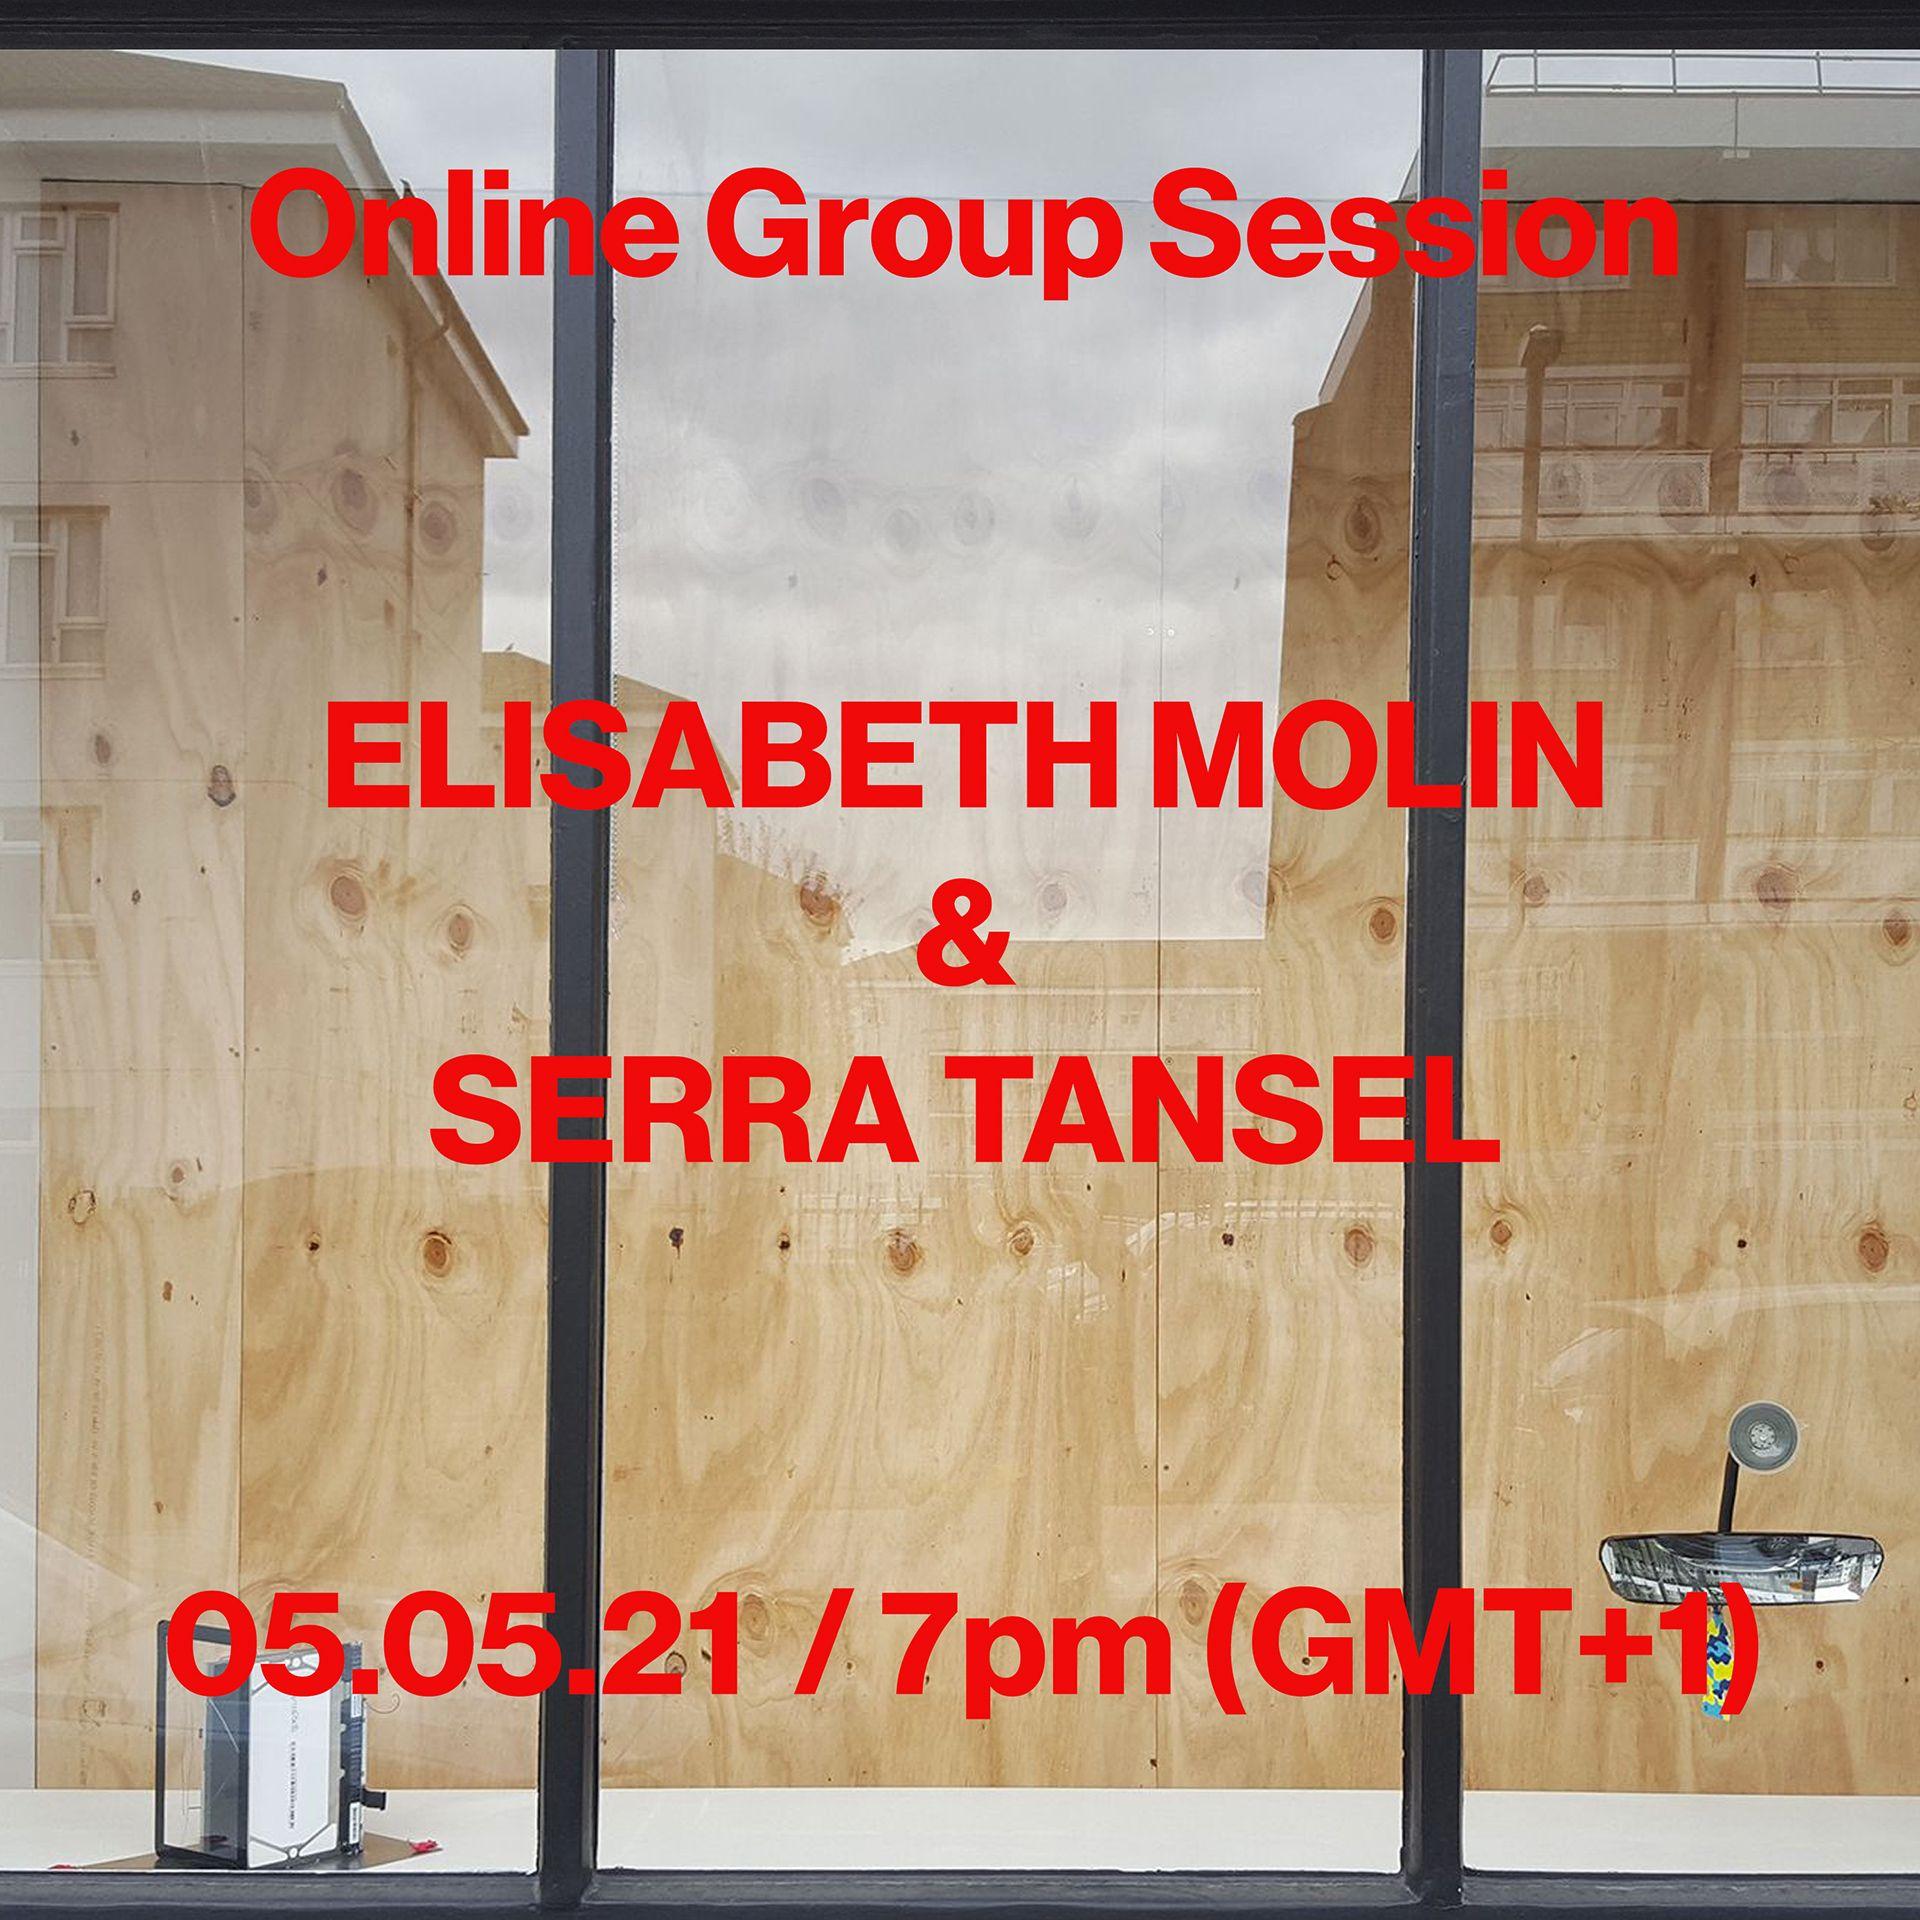 Online Group Session, Elisabeth Molin, Serra Tansel